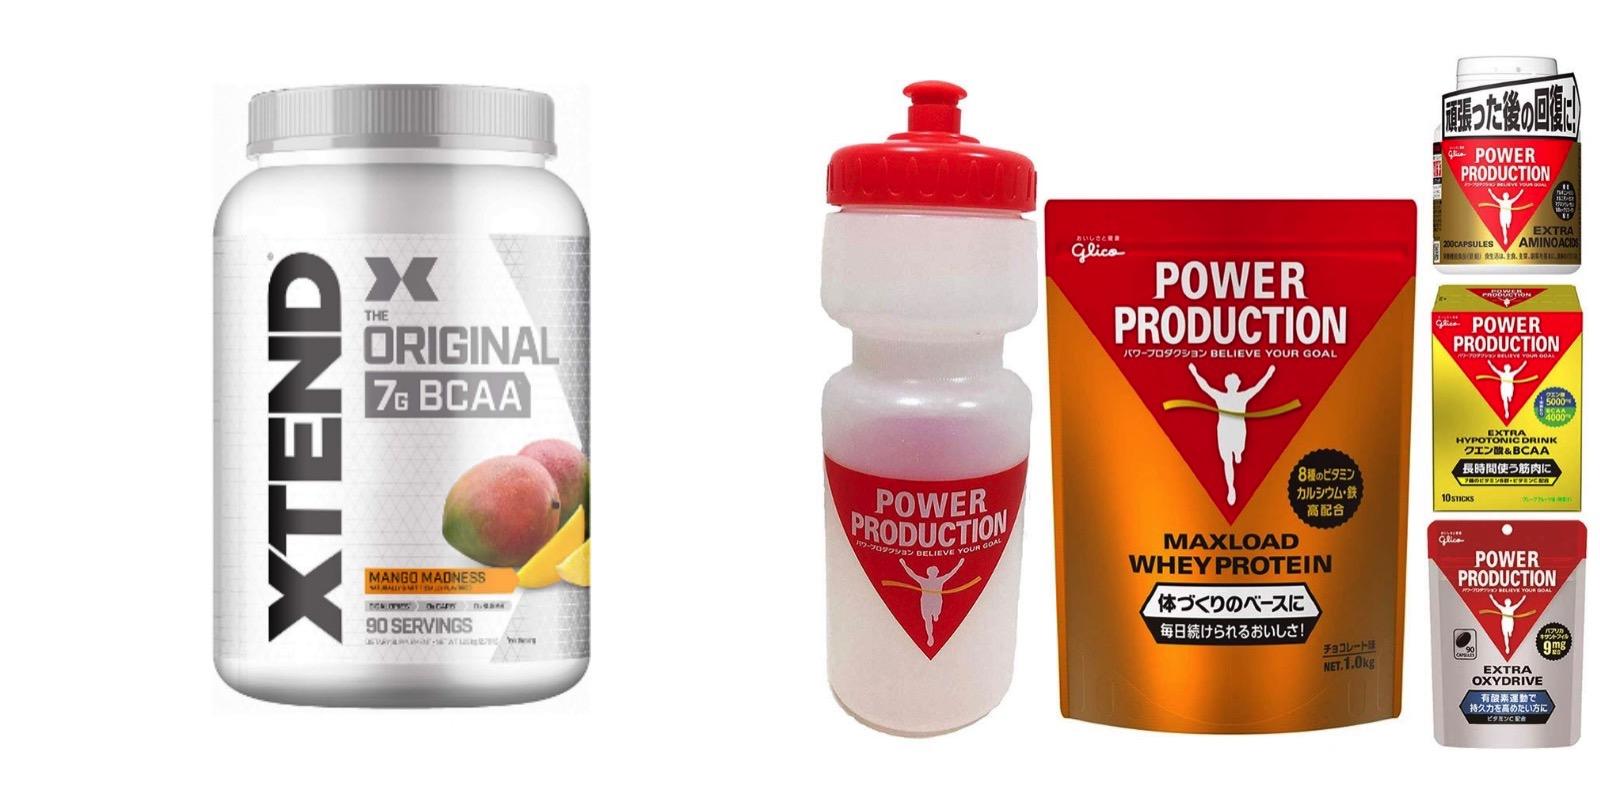 Health-Care-Supplements-Sale.jpg